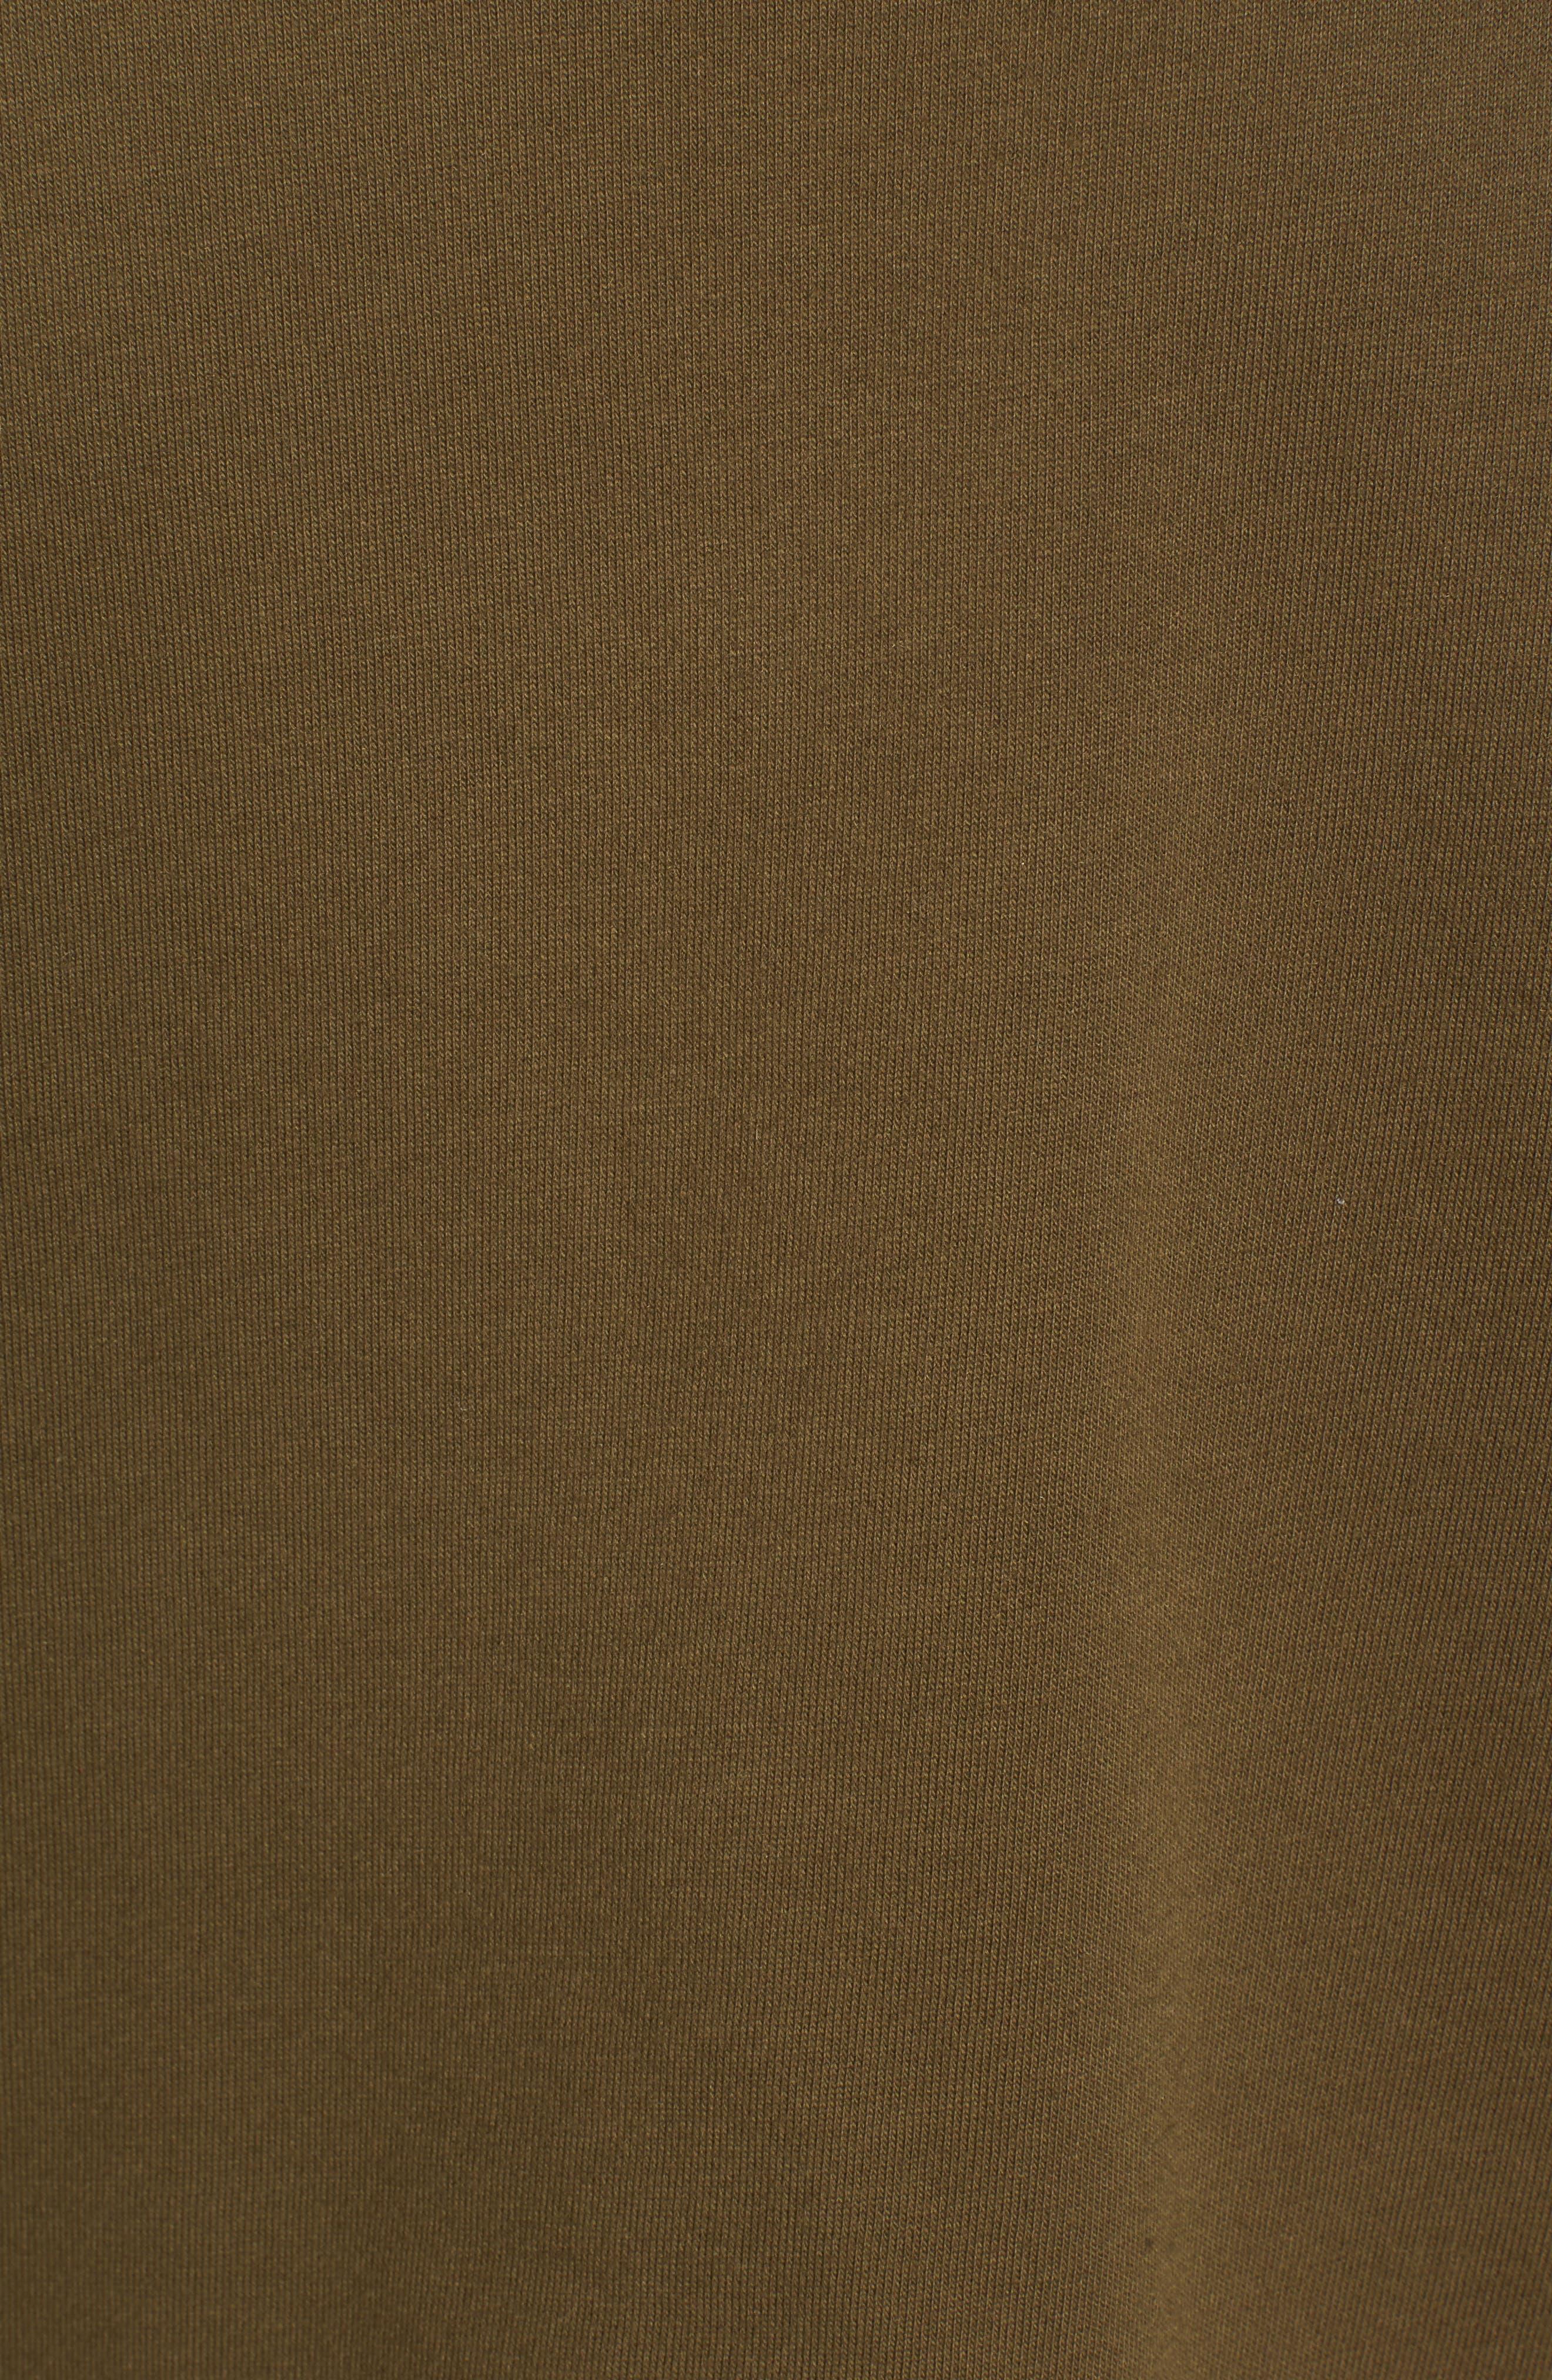 Pleat Sleeve Sweater,                             Alternate thumbnail 5, color,                             311